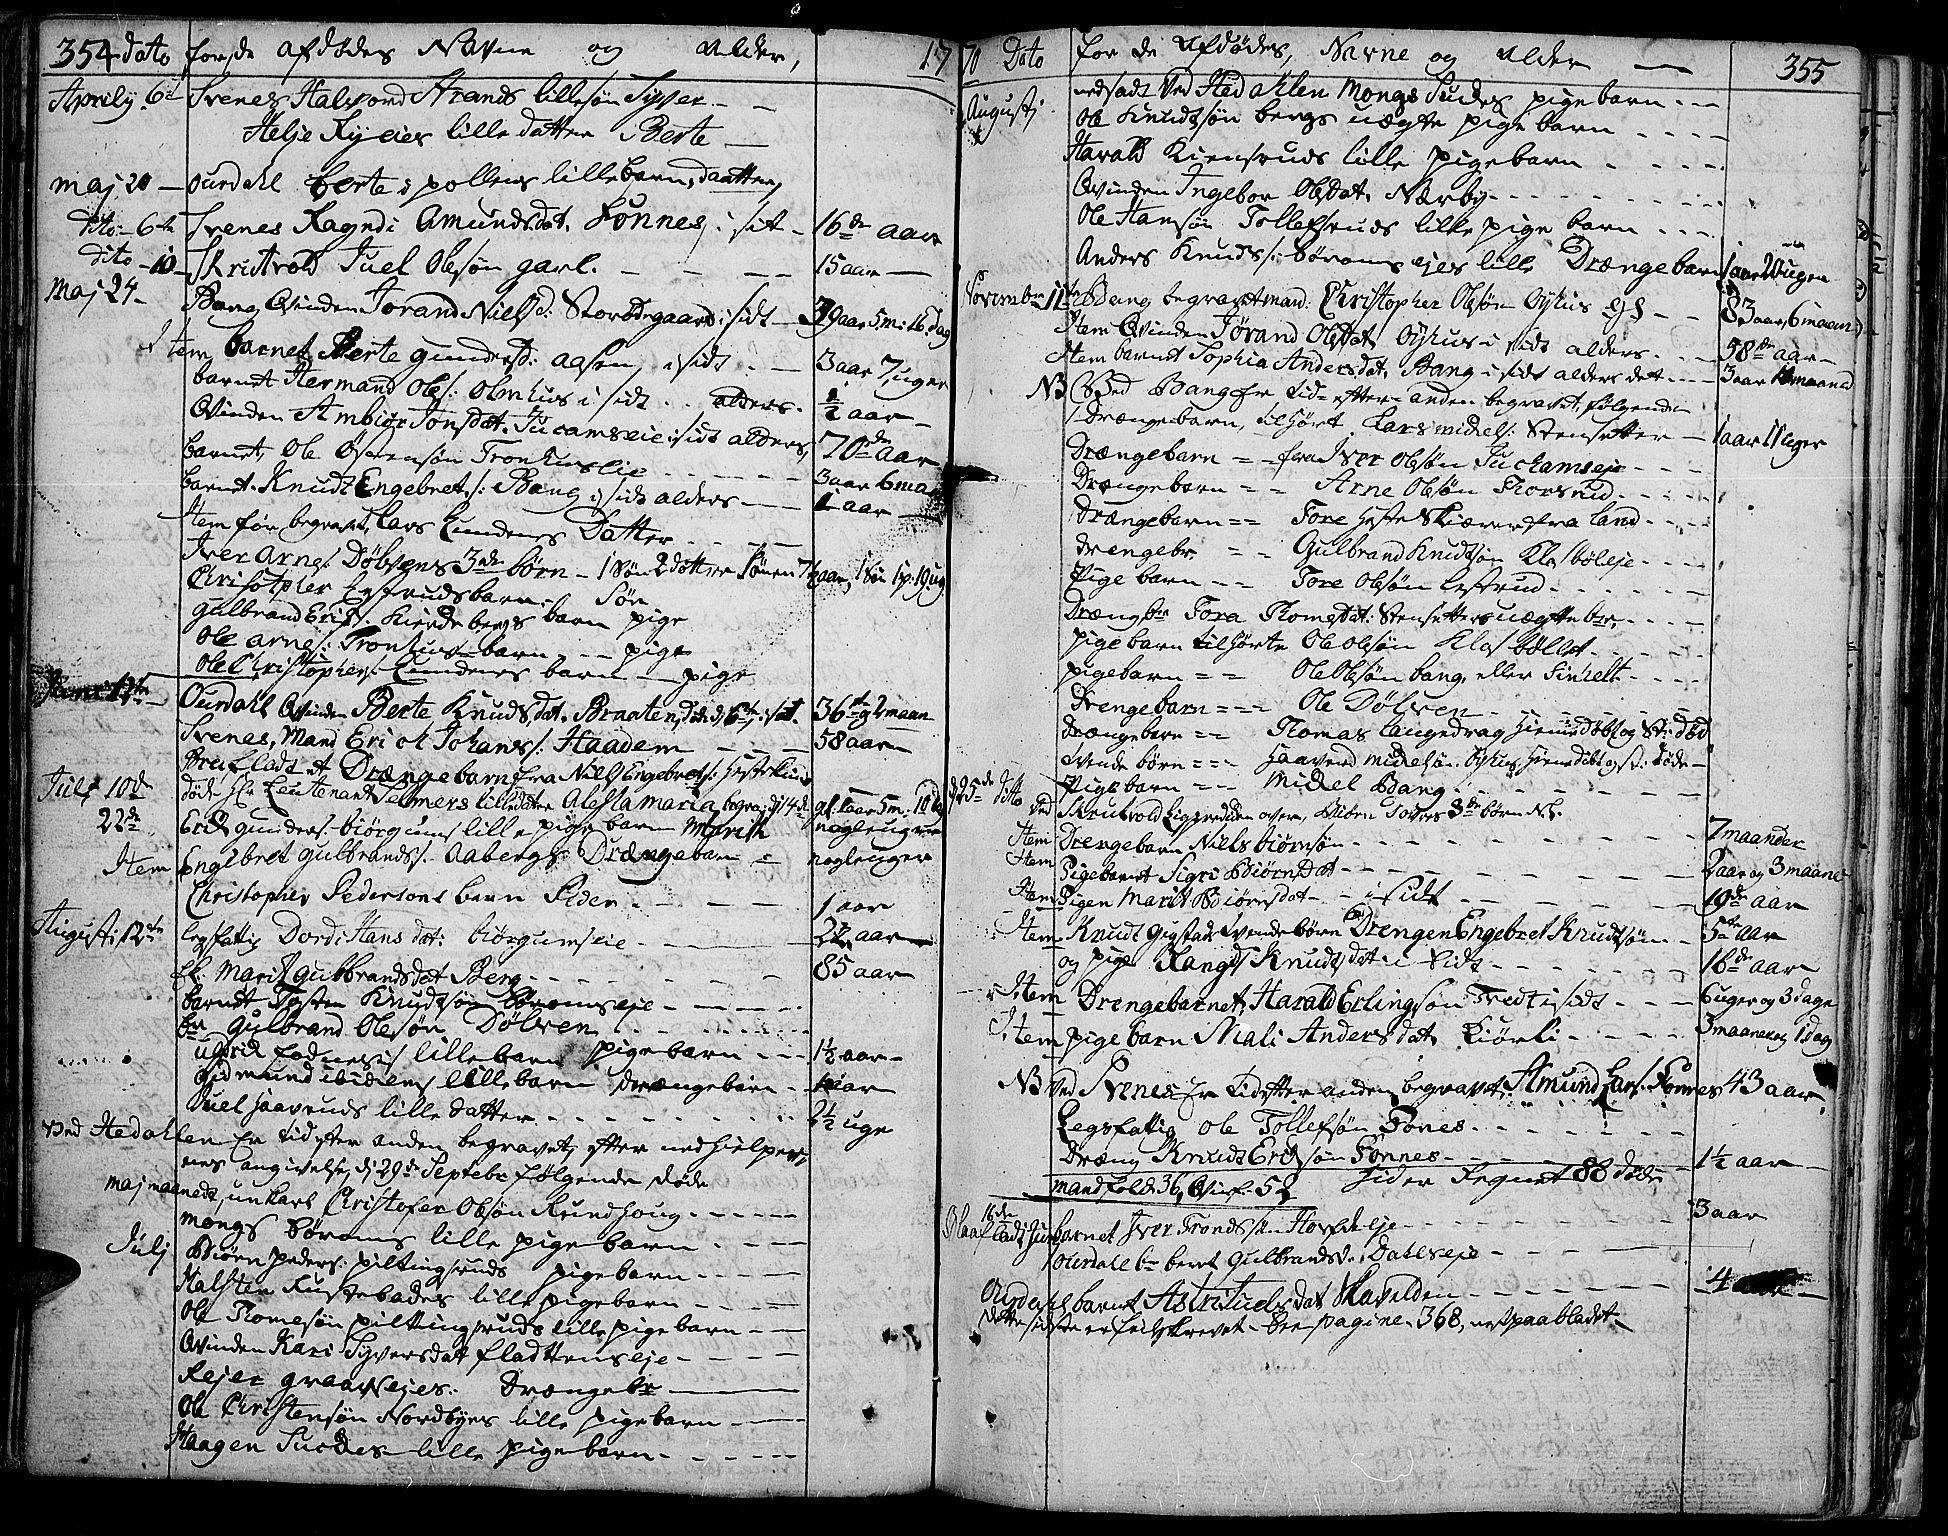 SAH, Aurdal prestekontor, Ministerialbok nr. 5, 1763-1781, s. 354-355